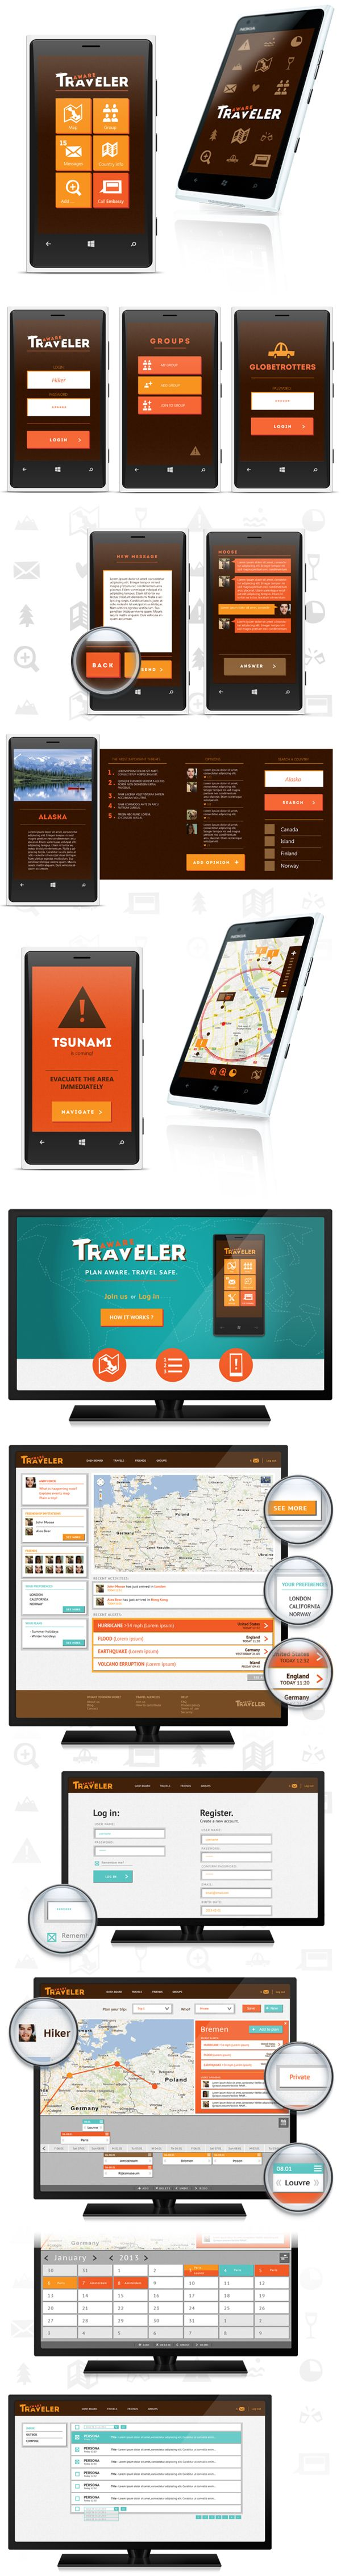 mobile app flat design